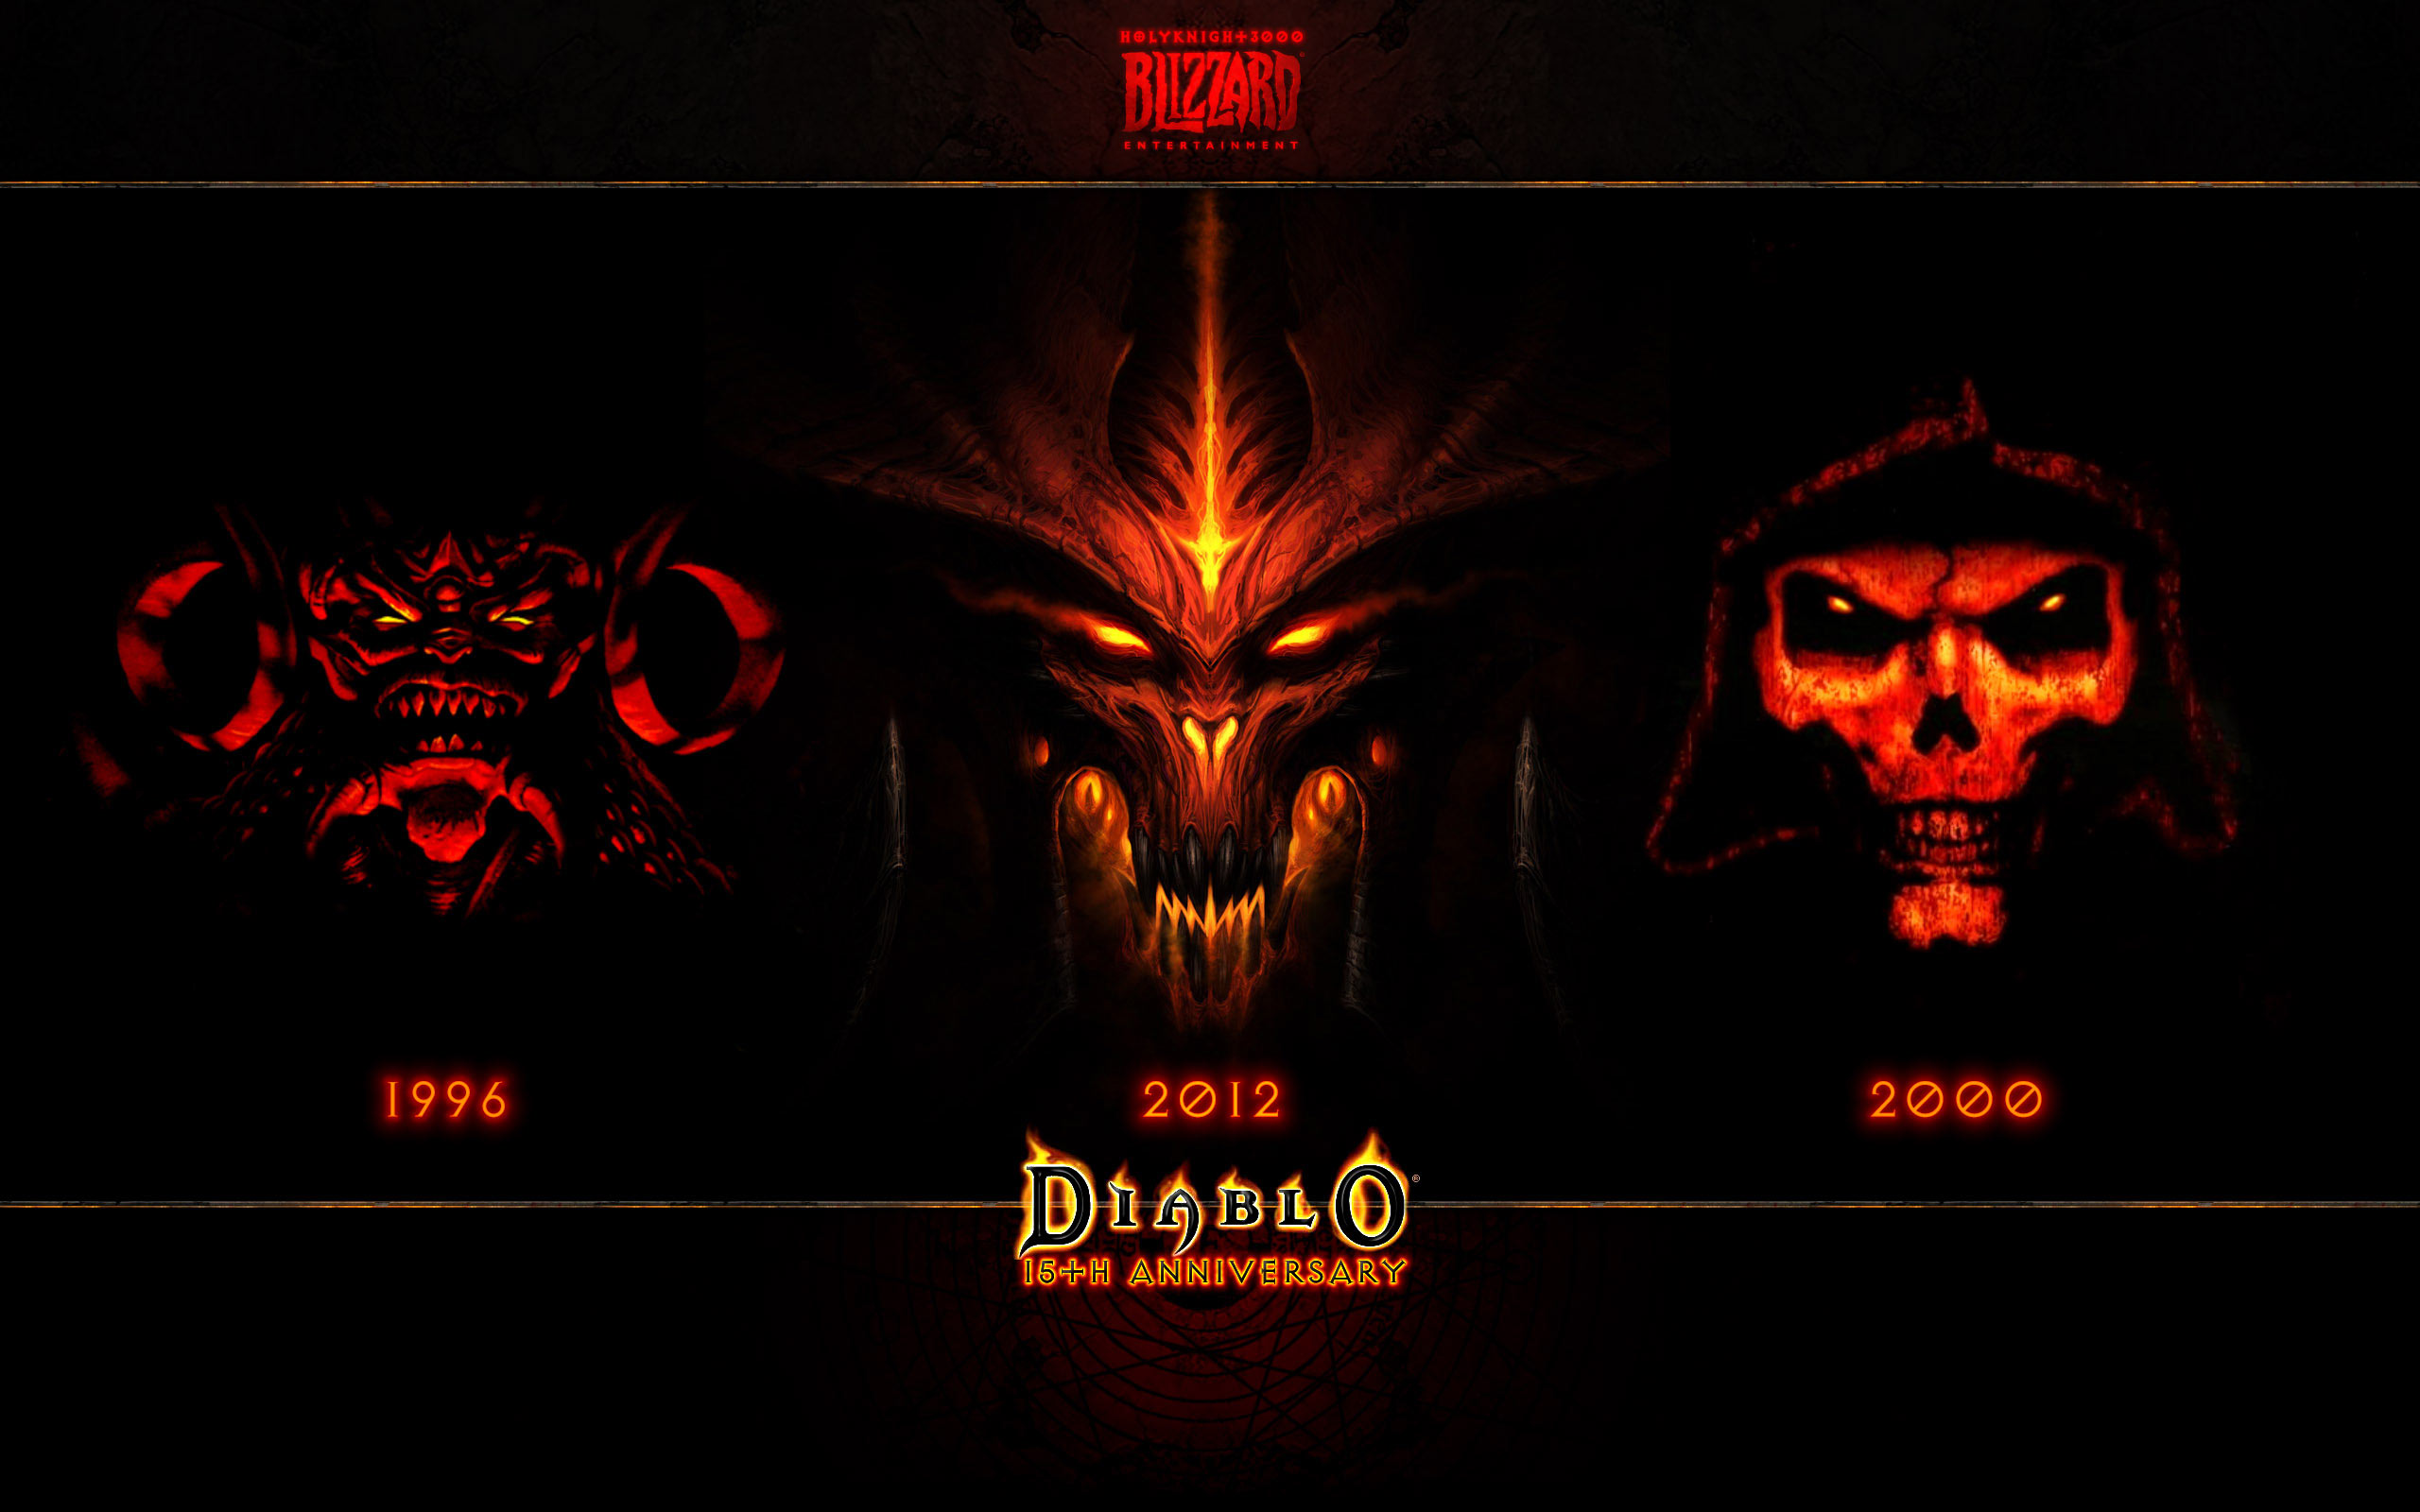 Diablo 3 Wallpaper Collections